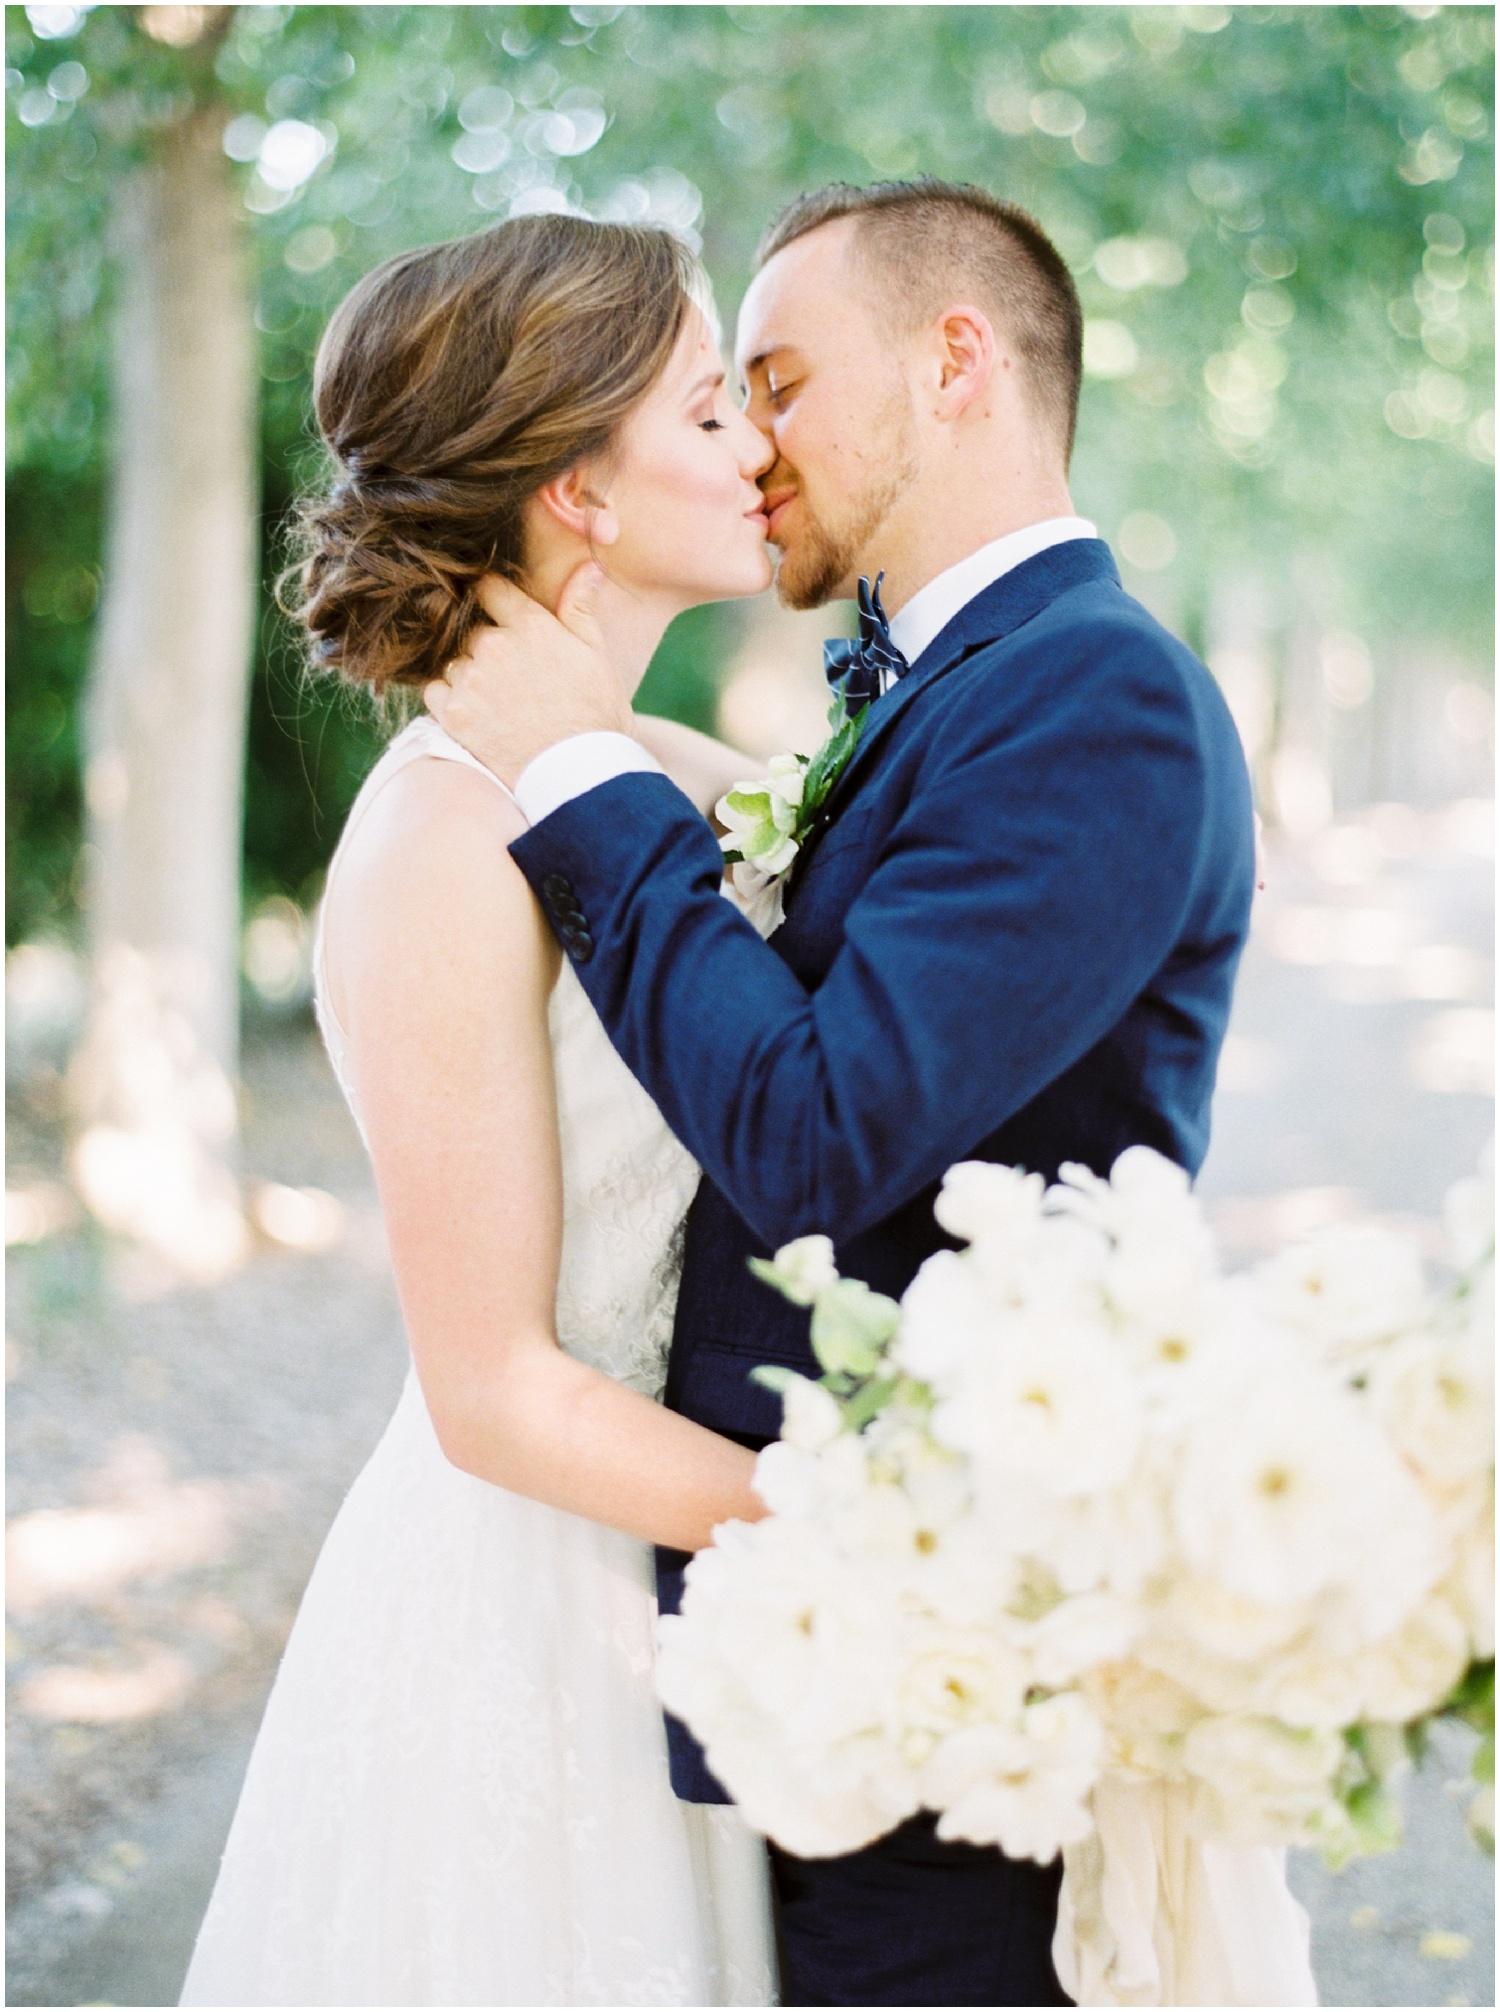 Fresno Wedding photography, Fresno Wedding photographers, California fine art wedding photographer, Fresno Wedding Photography, California Wedding Photographers